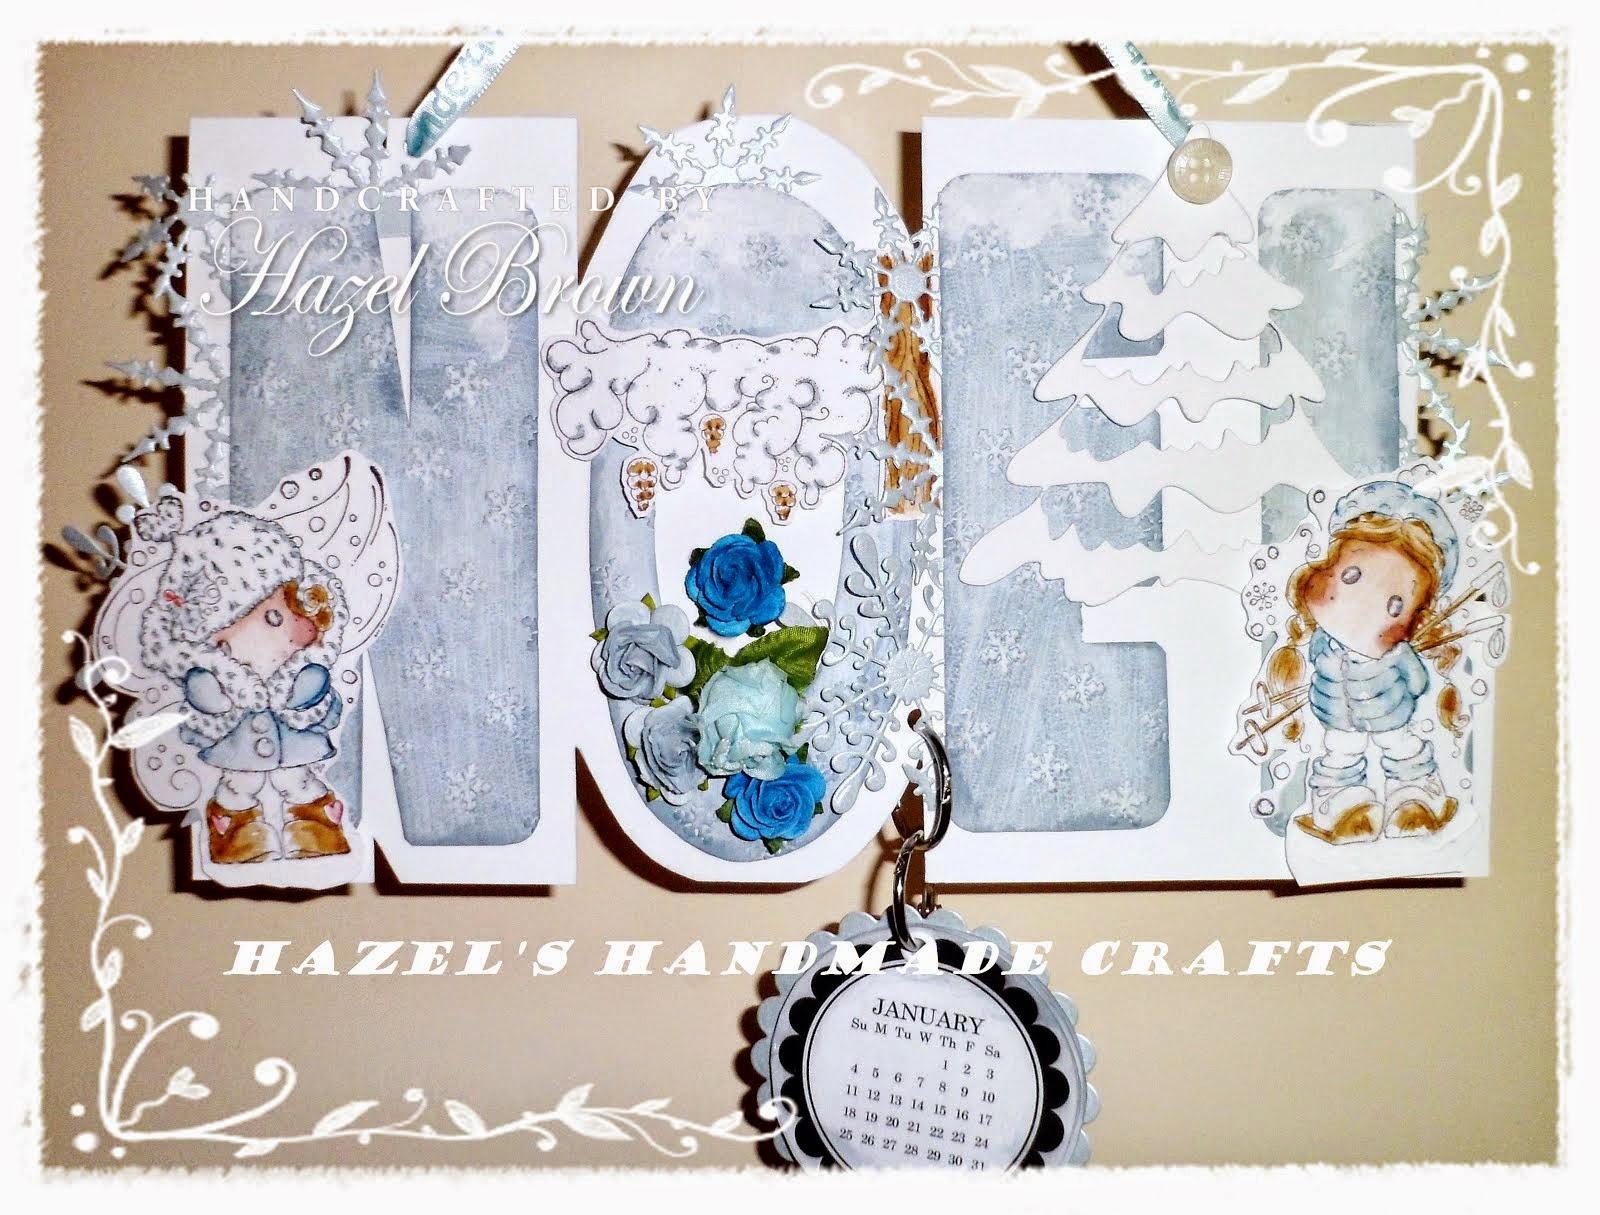 Hazel's Handmade crafts